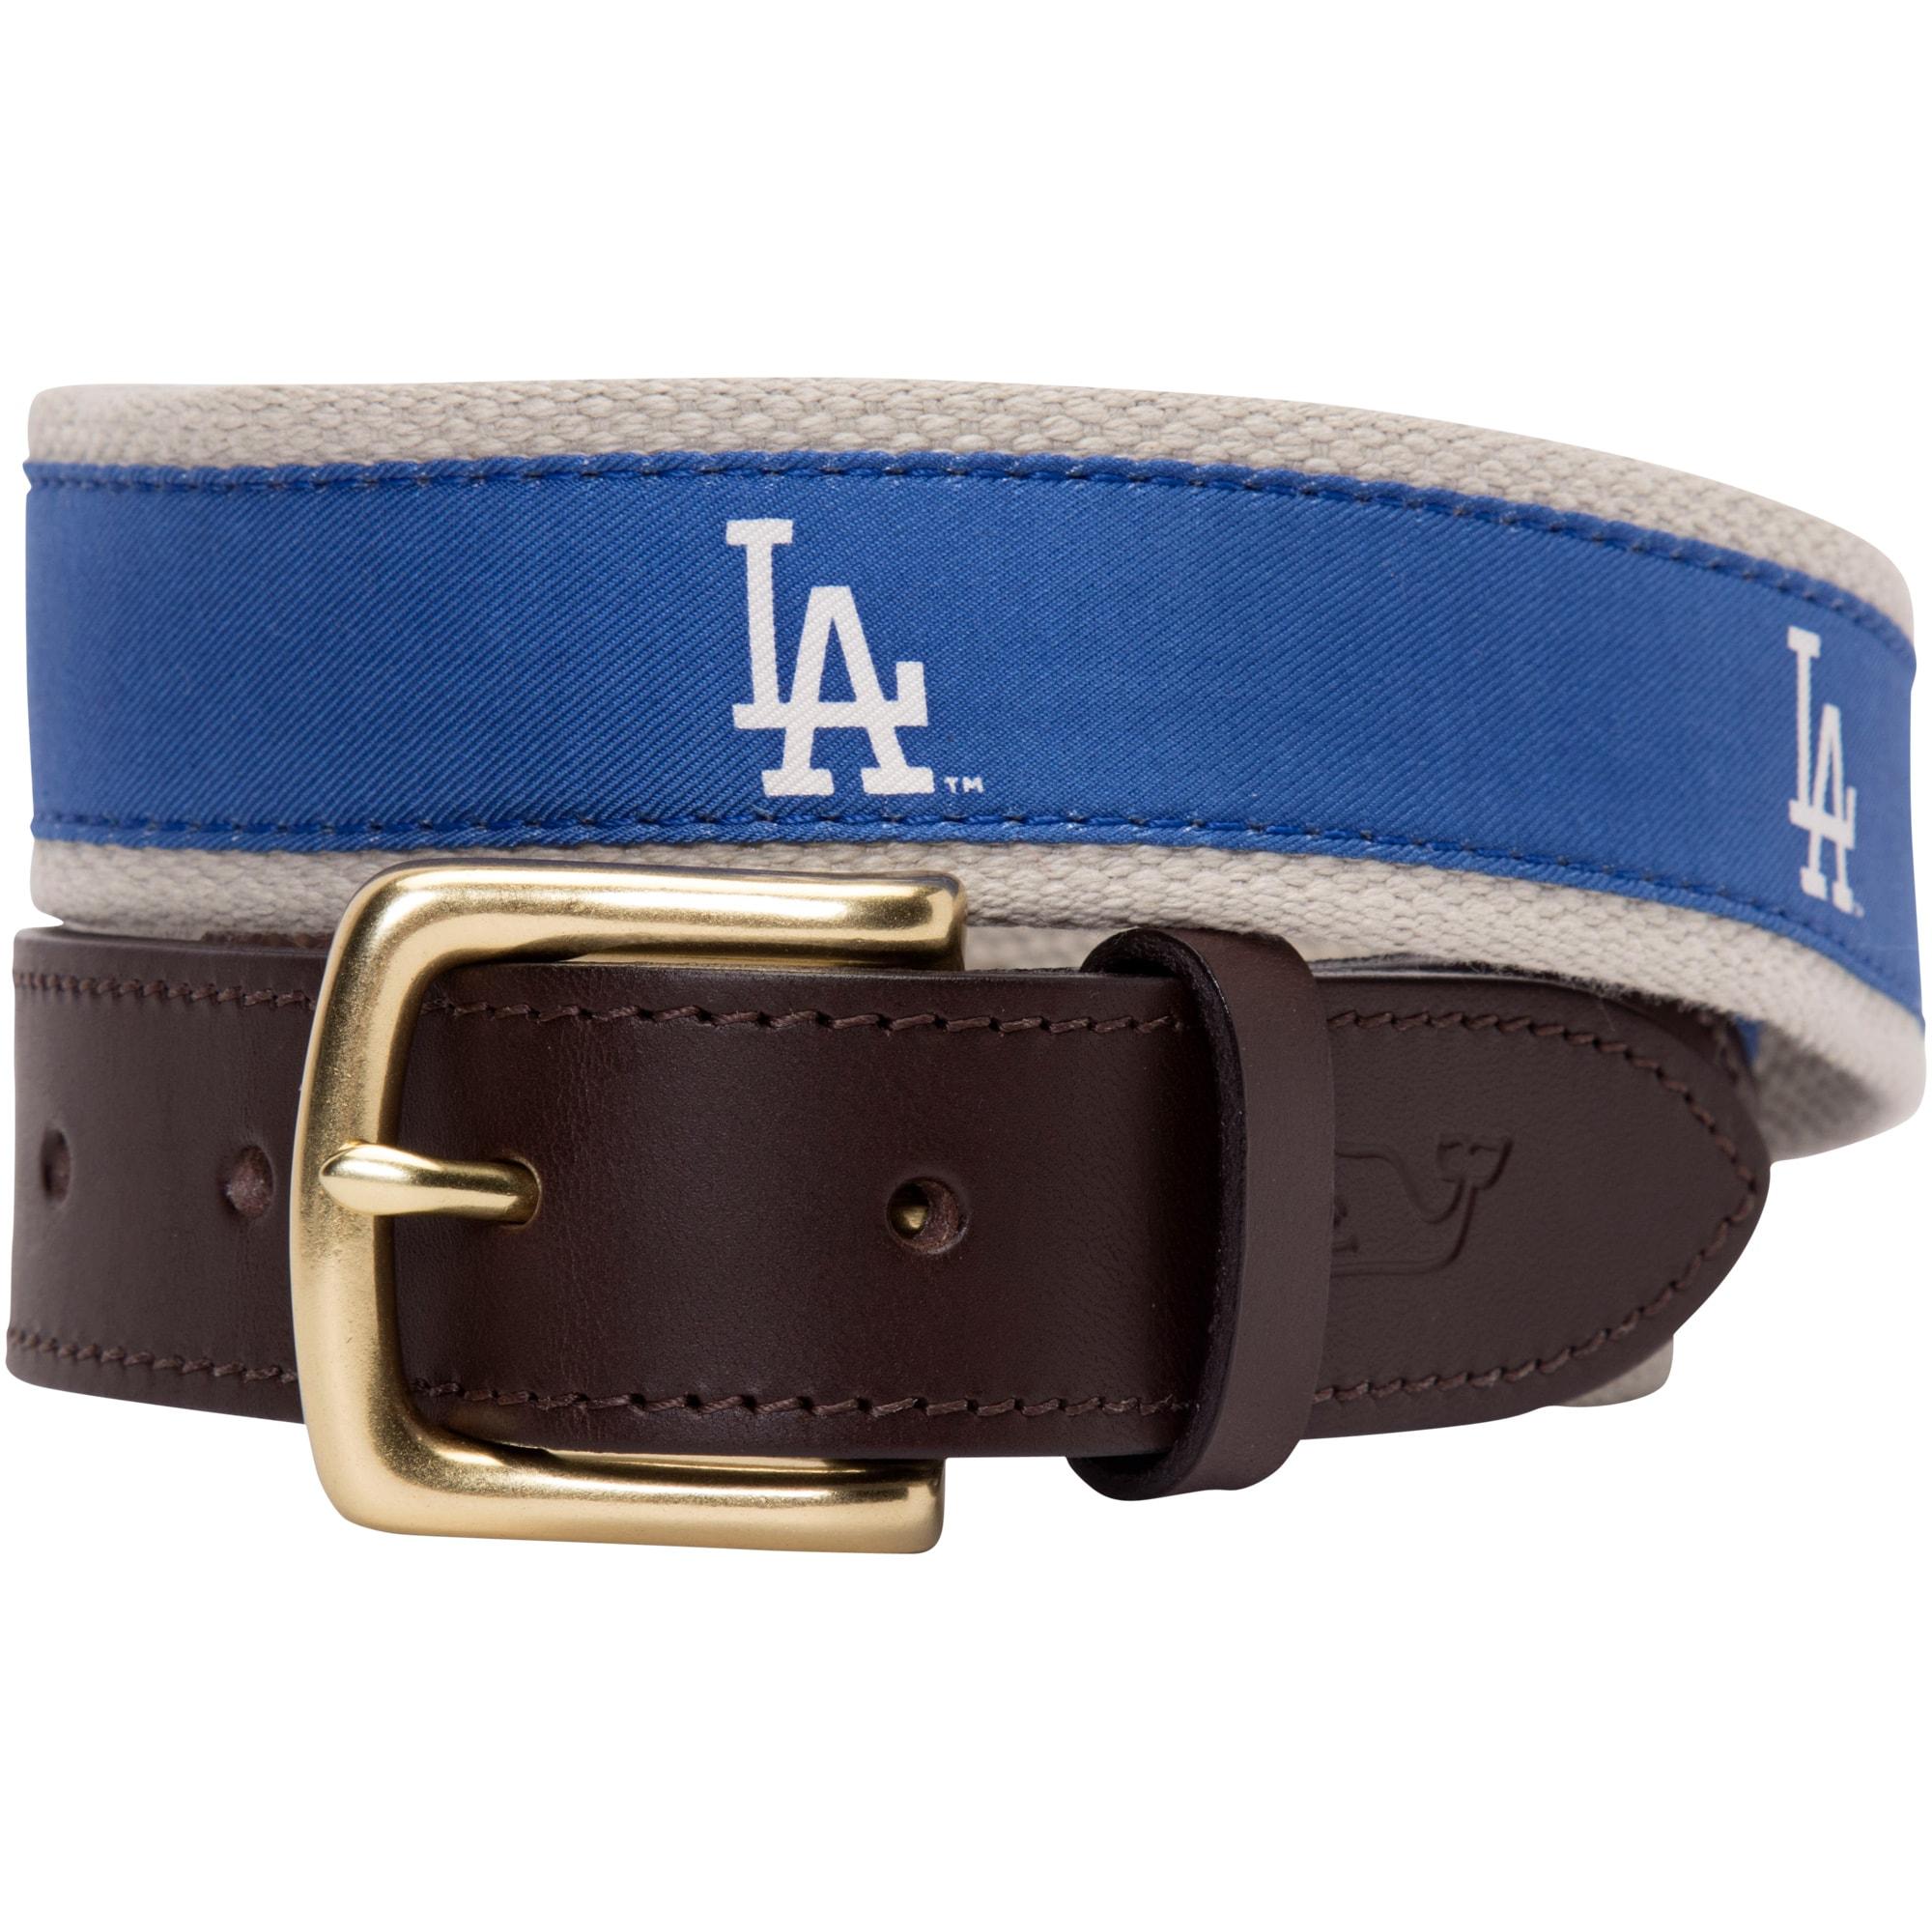 Los Angeles Dodgers Vineyard Vines MLB Canvas Belt - Royal